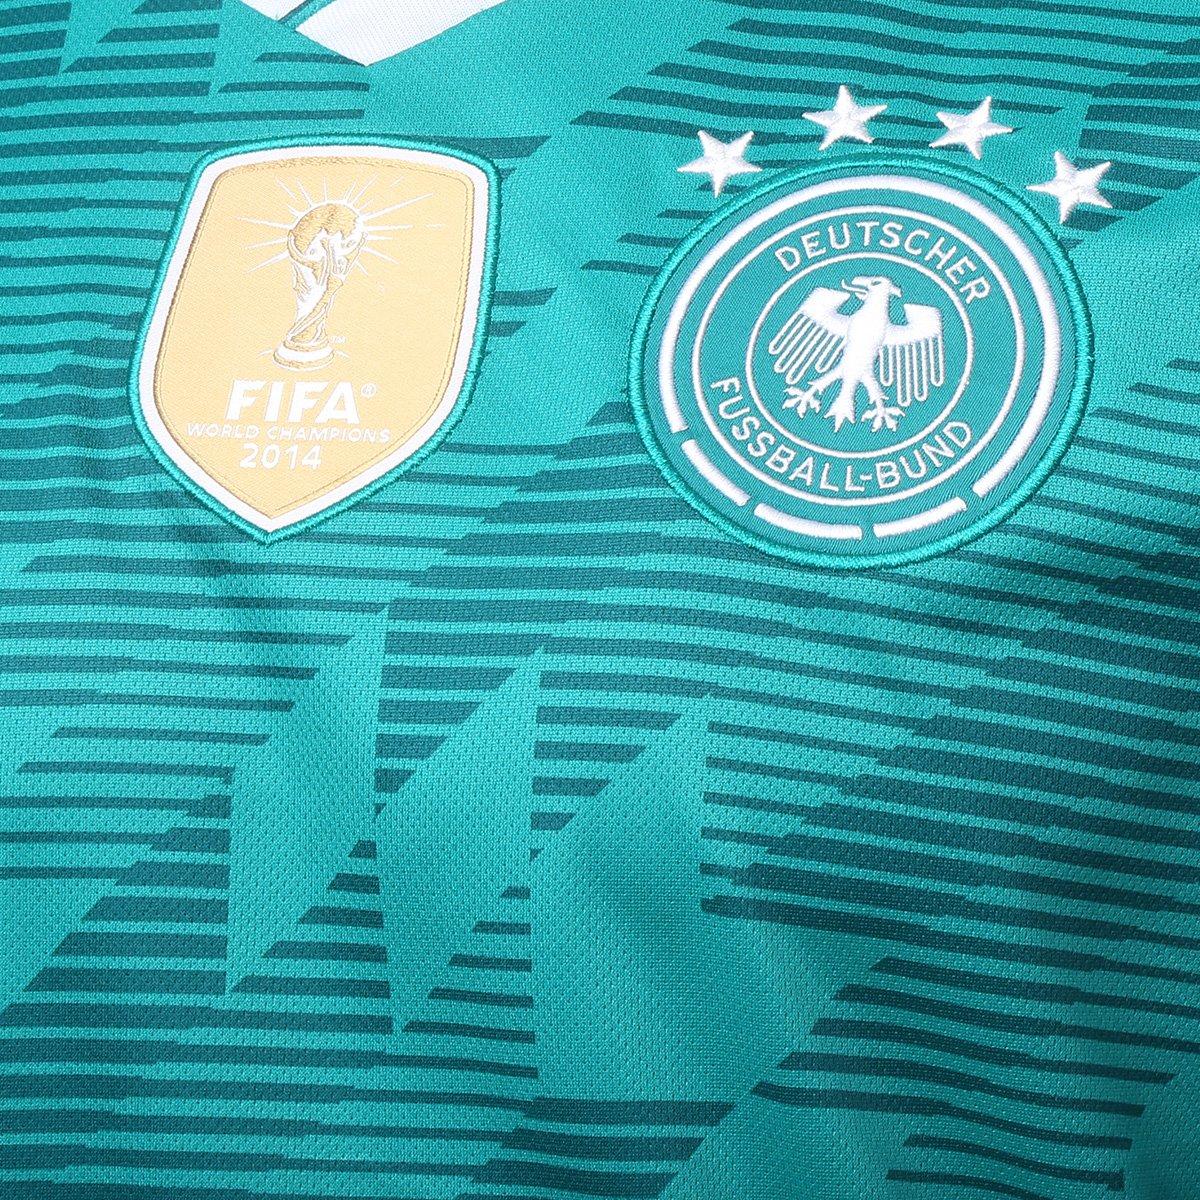 ... Camisa Seleção Alemanha Away 2018 n° 15 Süle - Torcedor Adidas Masculina  ... 5cc10d9b57240